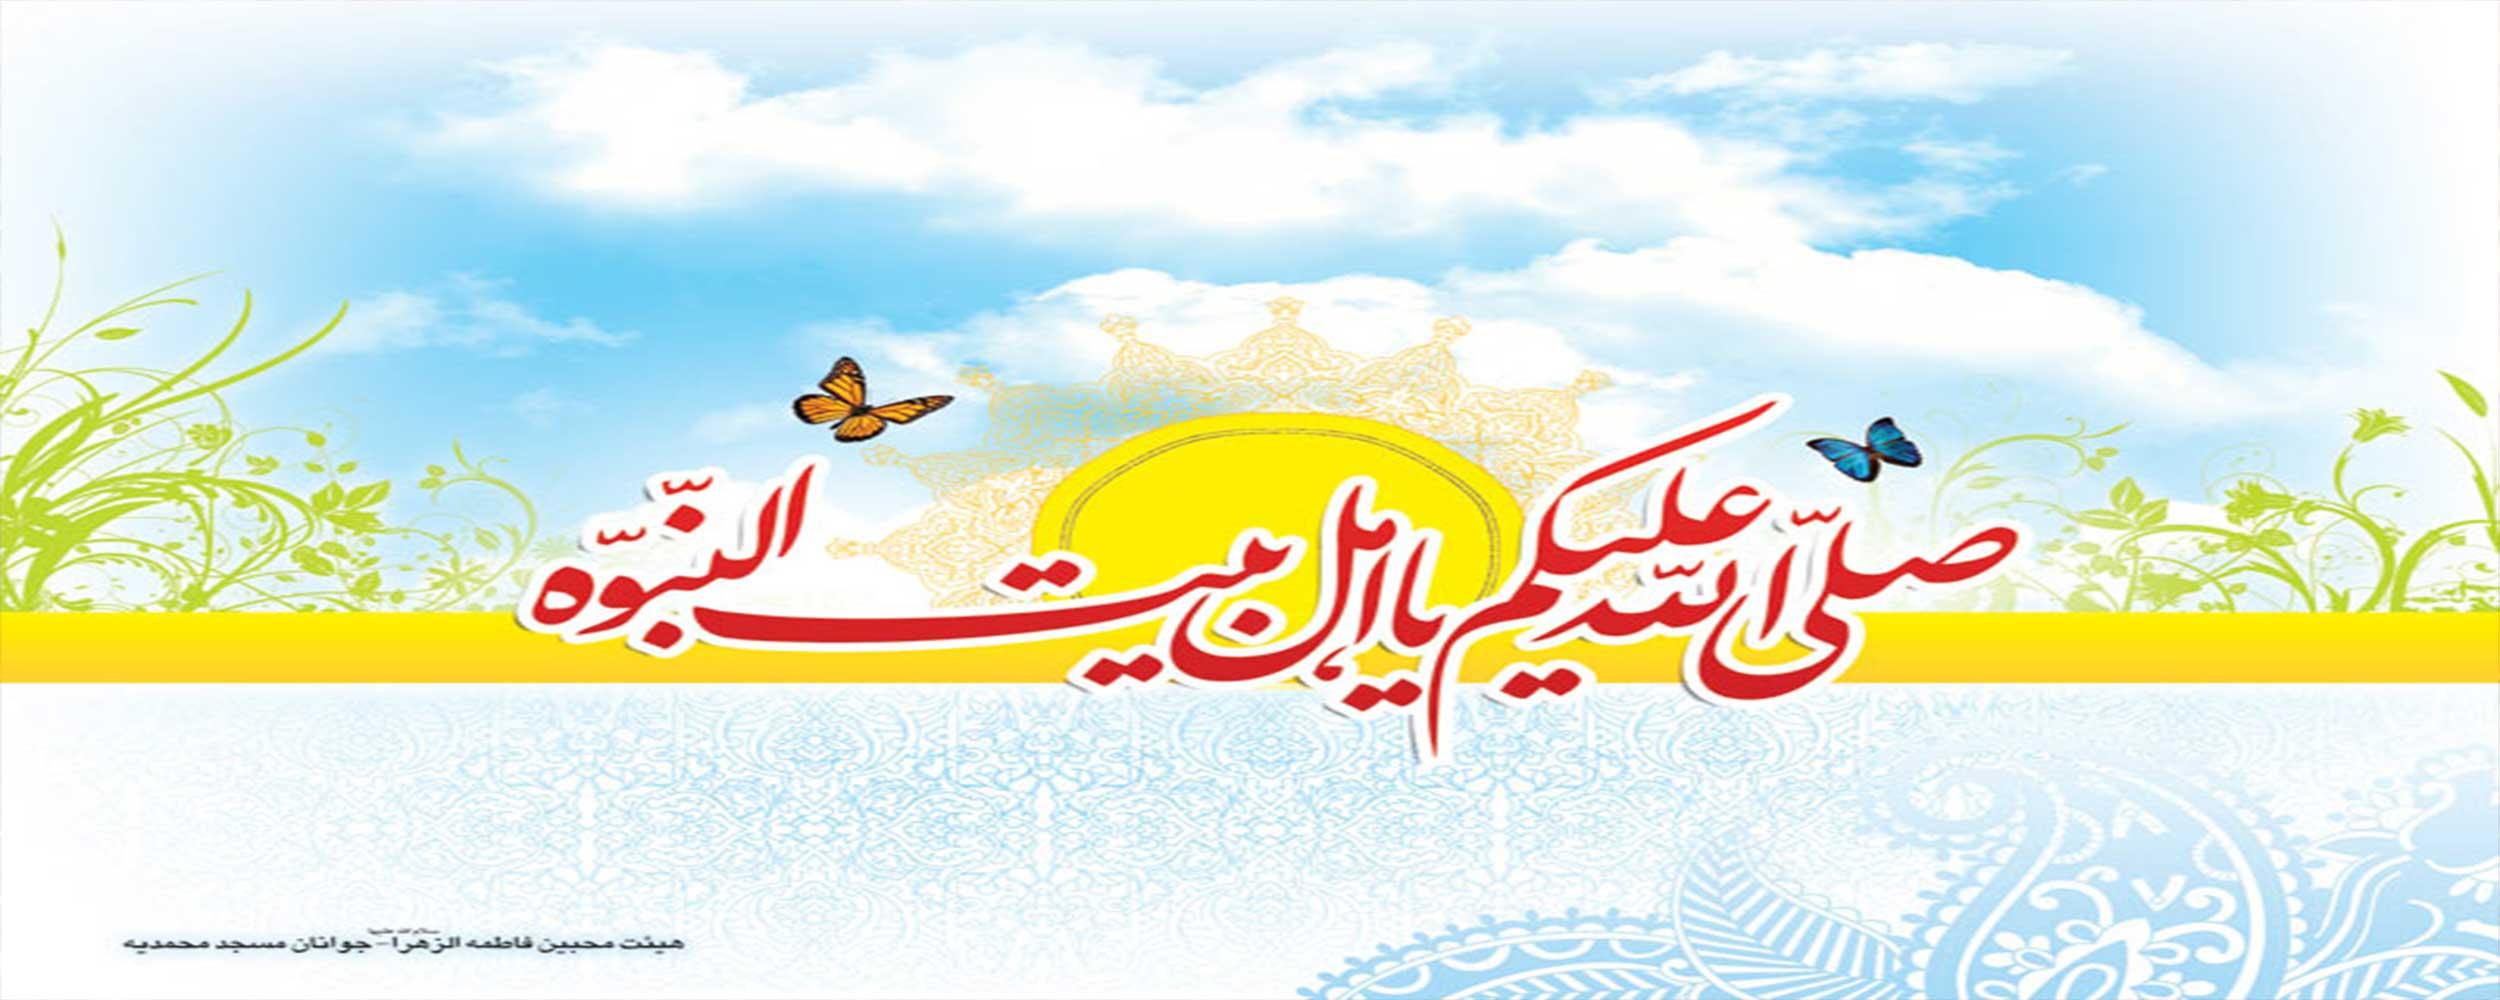 حسینیه و فرهنگسرای سیدالشهداء(علیه السلام)